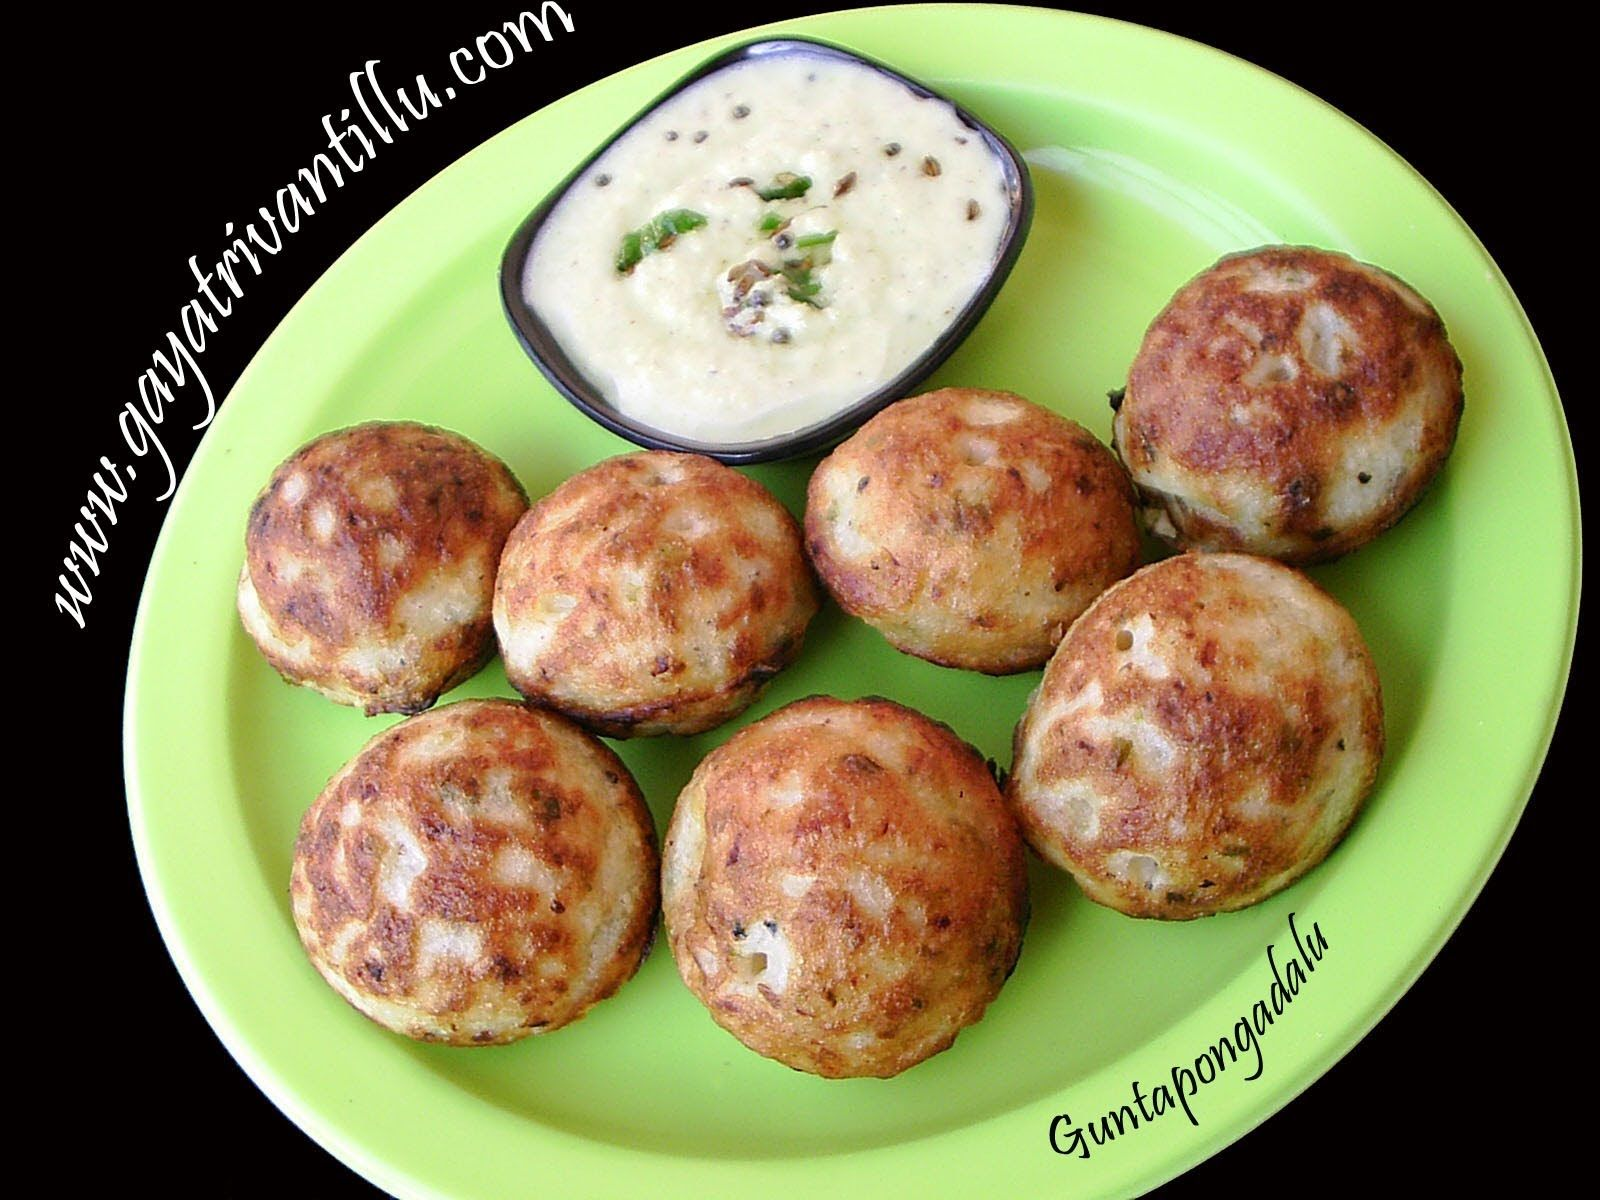 Gunta pongadalu breakfast recipes indian telugu food recipes gunta pongadalu breakfast recipes indian telugu food forumfinder Images